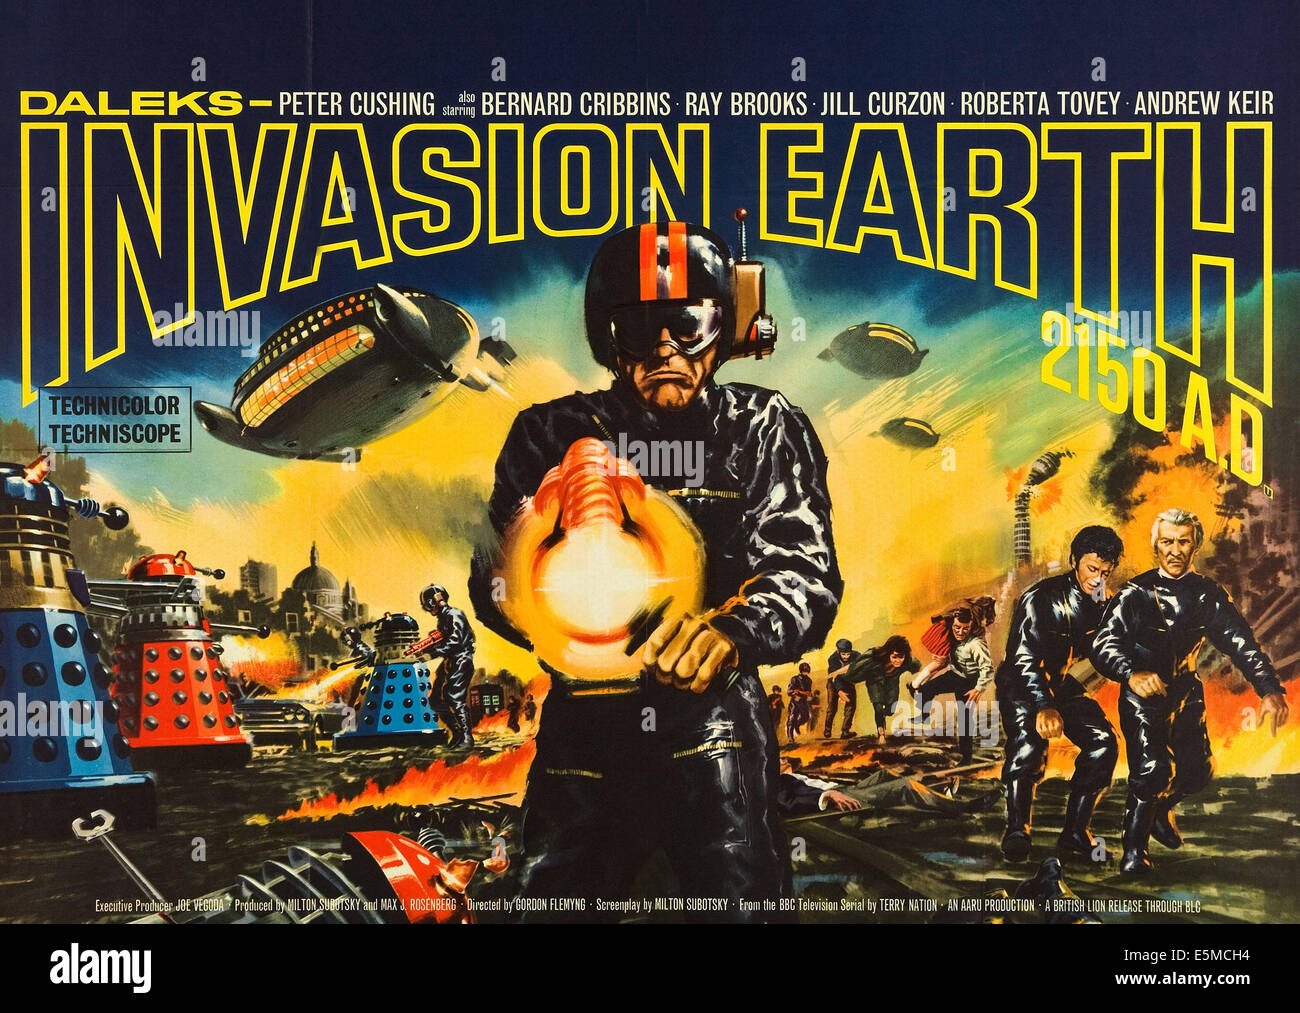 DALEKS' INVASION EARTH: 2150 A.D., British poster art, 1966. - Stock Image